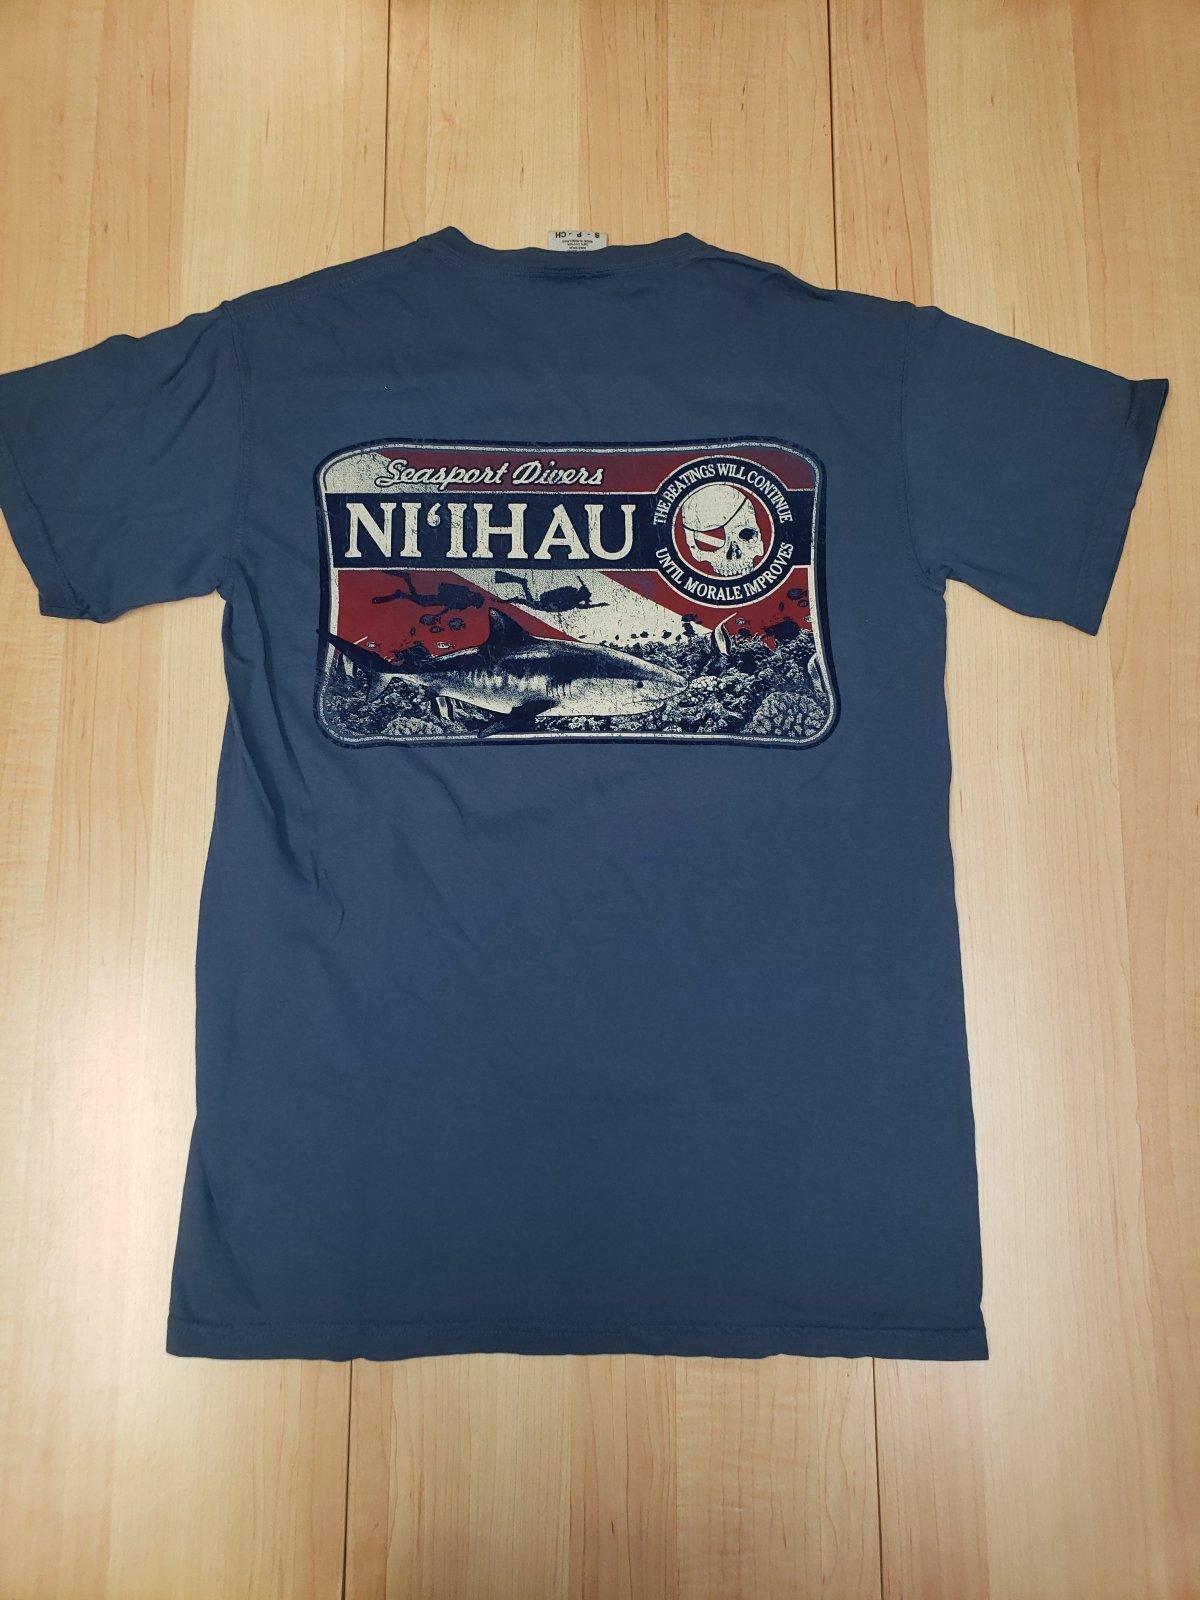 Windsor Dive Ni'ihau T-Shirt